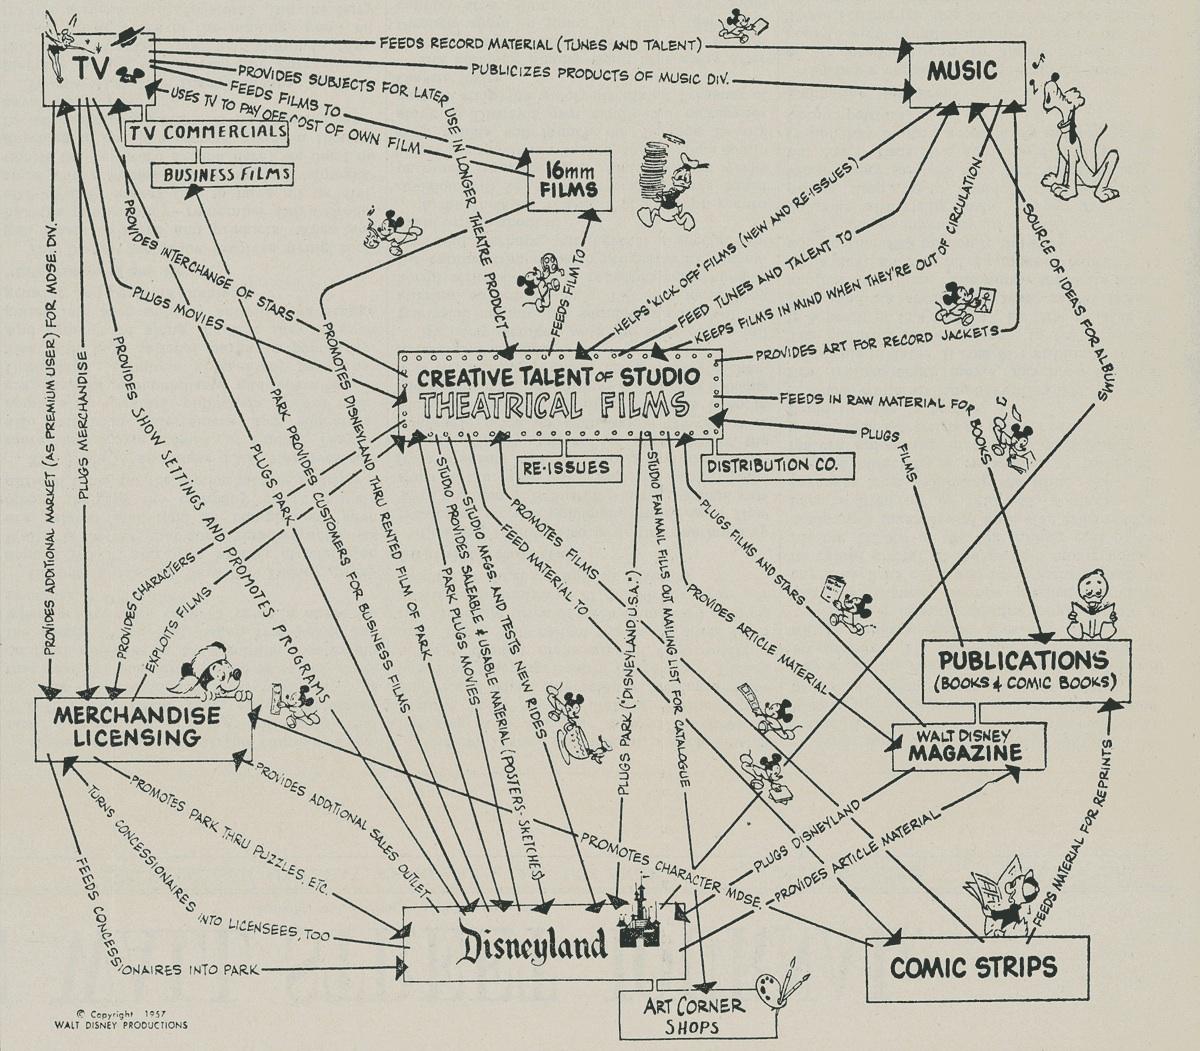 corporate chart